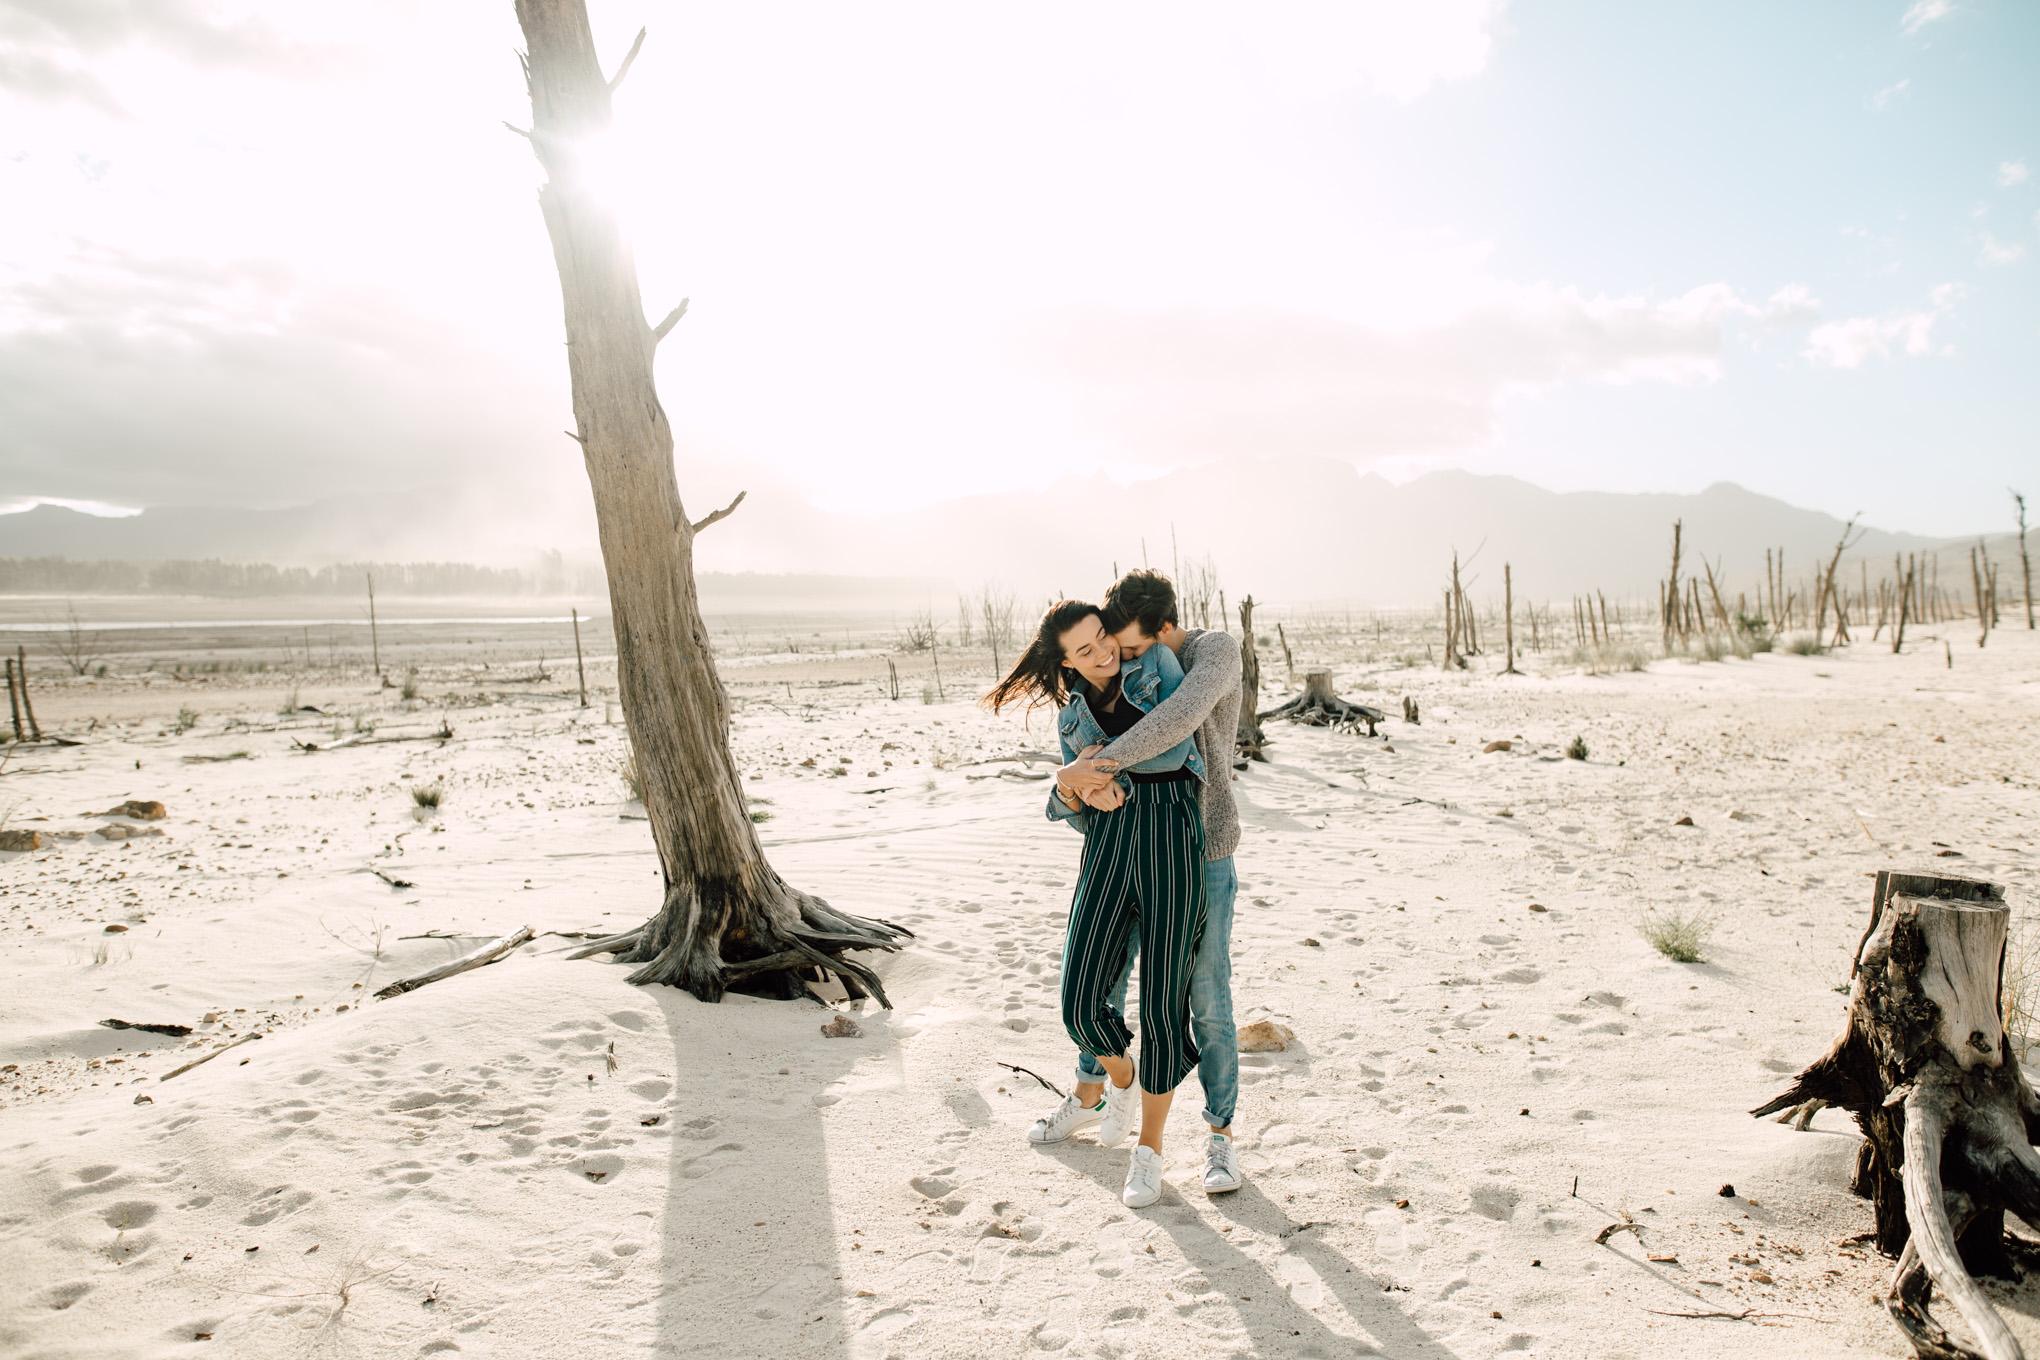 Cape-Town-Pia-Anna-Christian-Wedding-Photography-South-Africa-KF-33.jpg